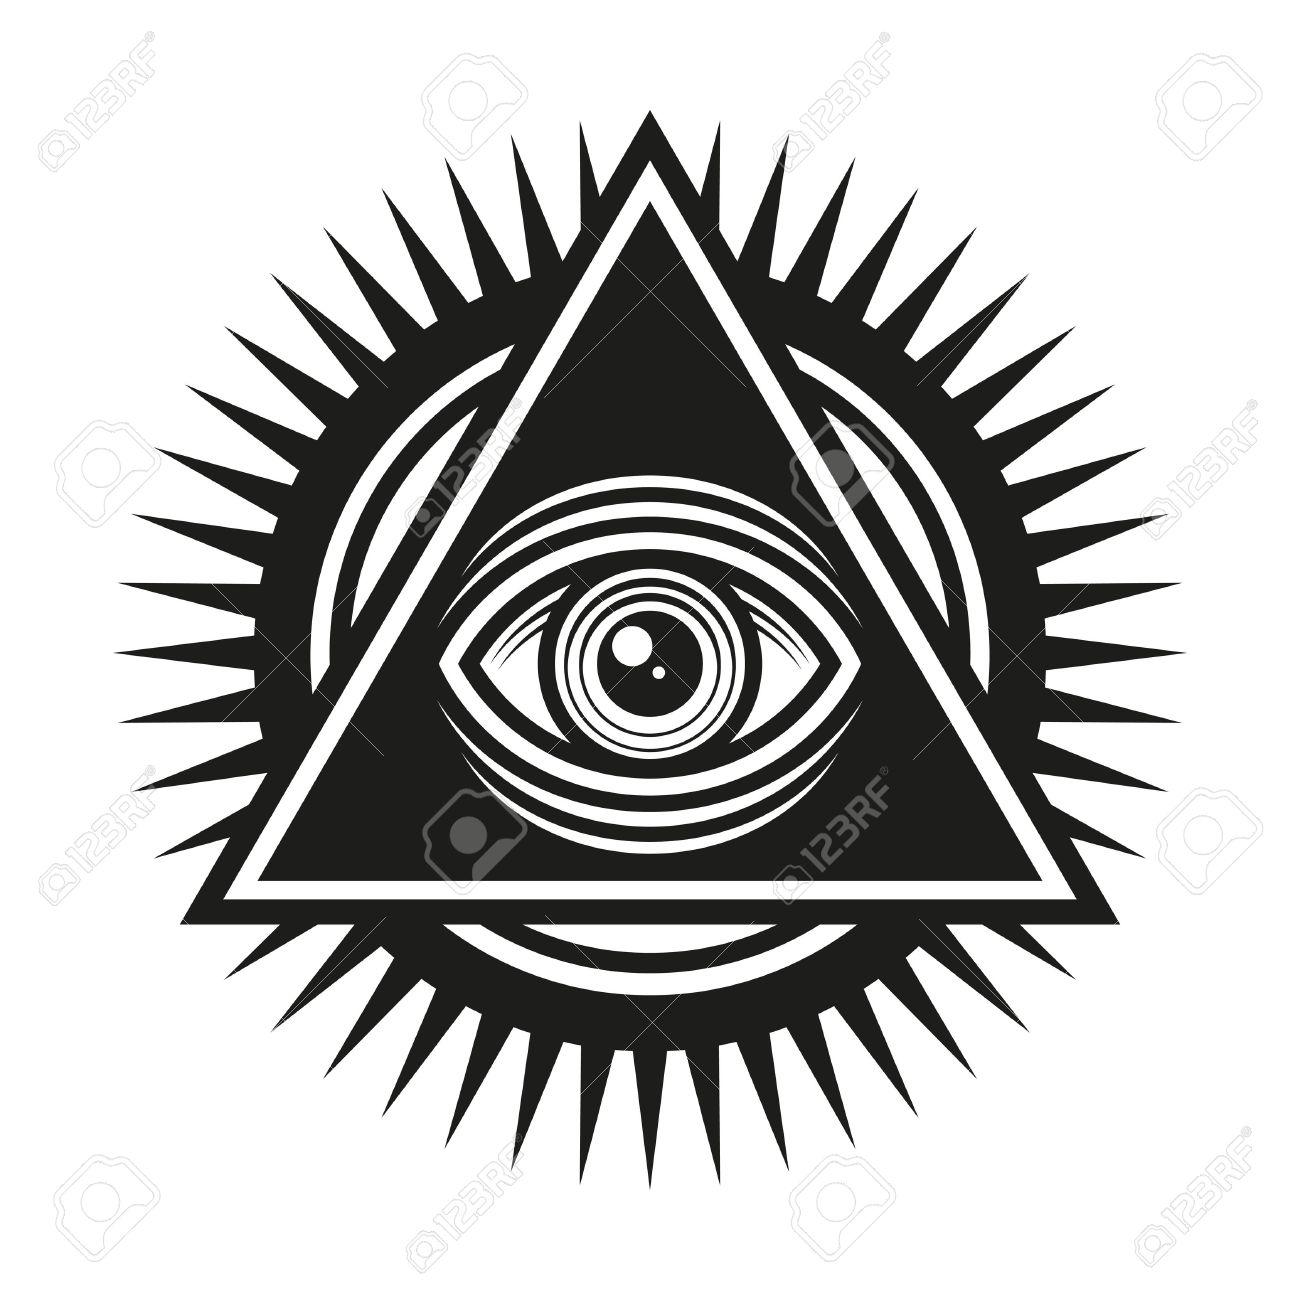 Masonic symbol all seeing eye inside pyramid triangle icon masonic symbol all seeing eye inside pyramid triangle icon vector illustration stock vector buycottarizona Image collections